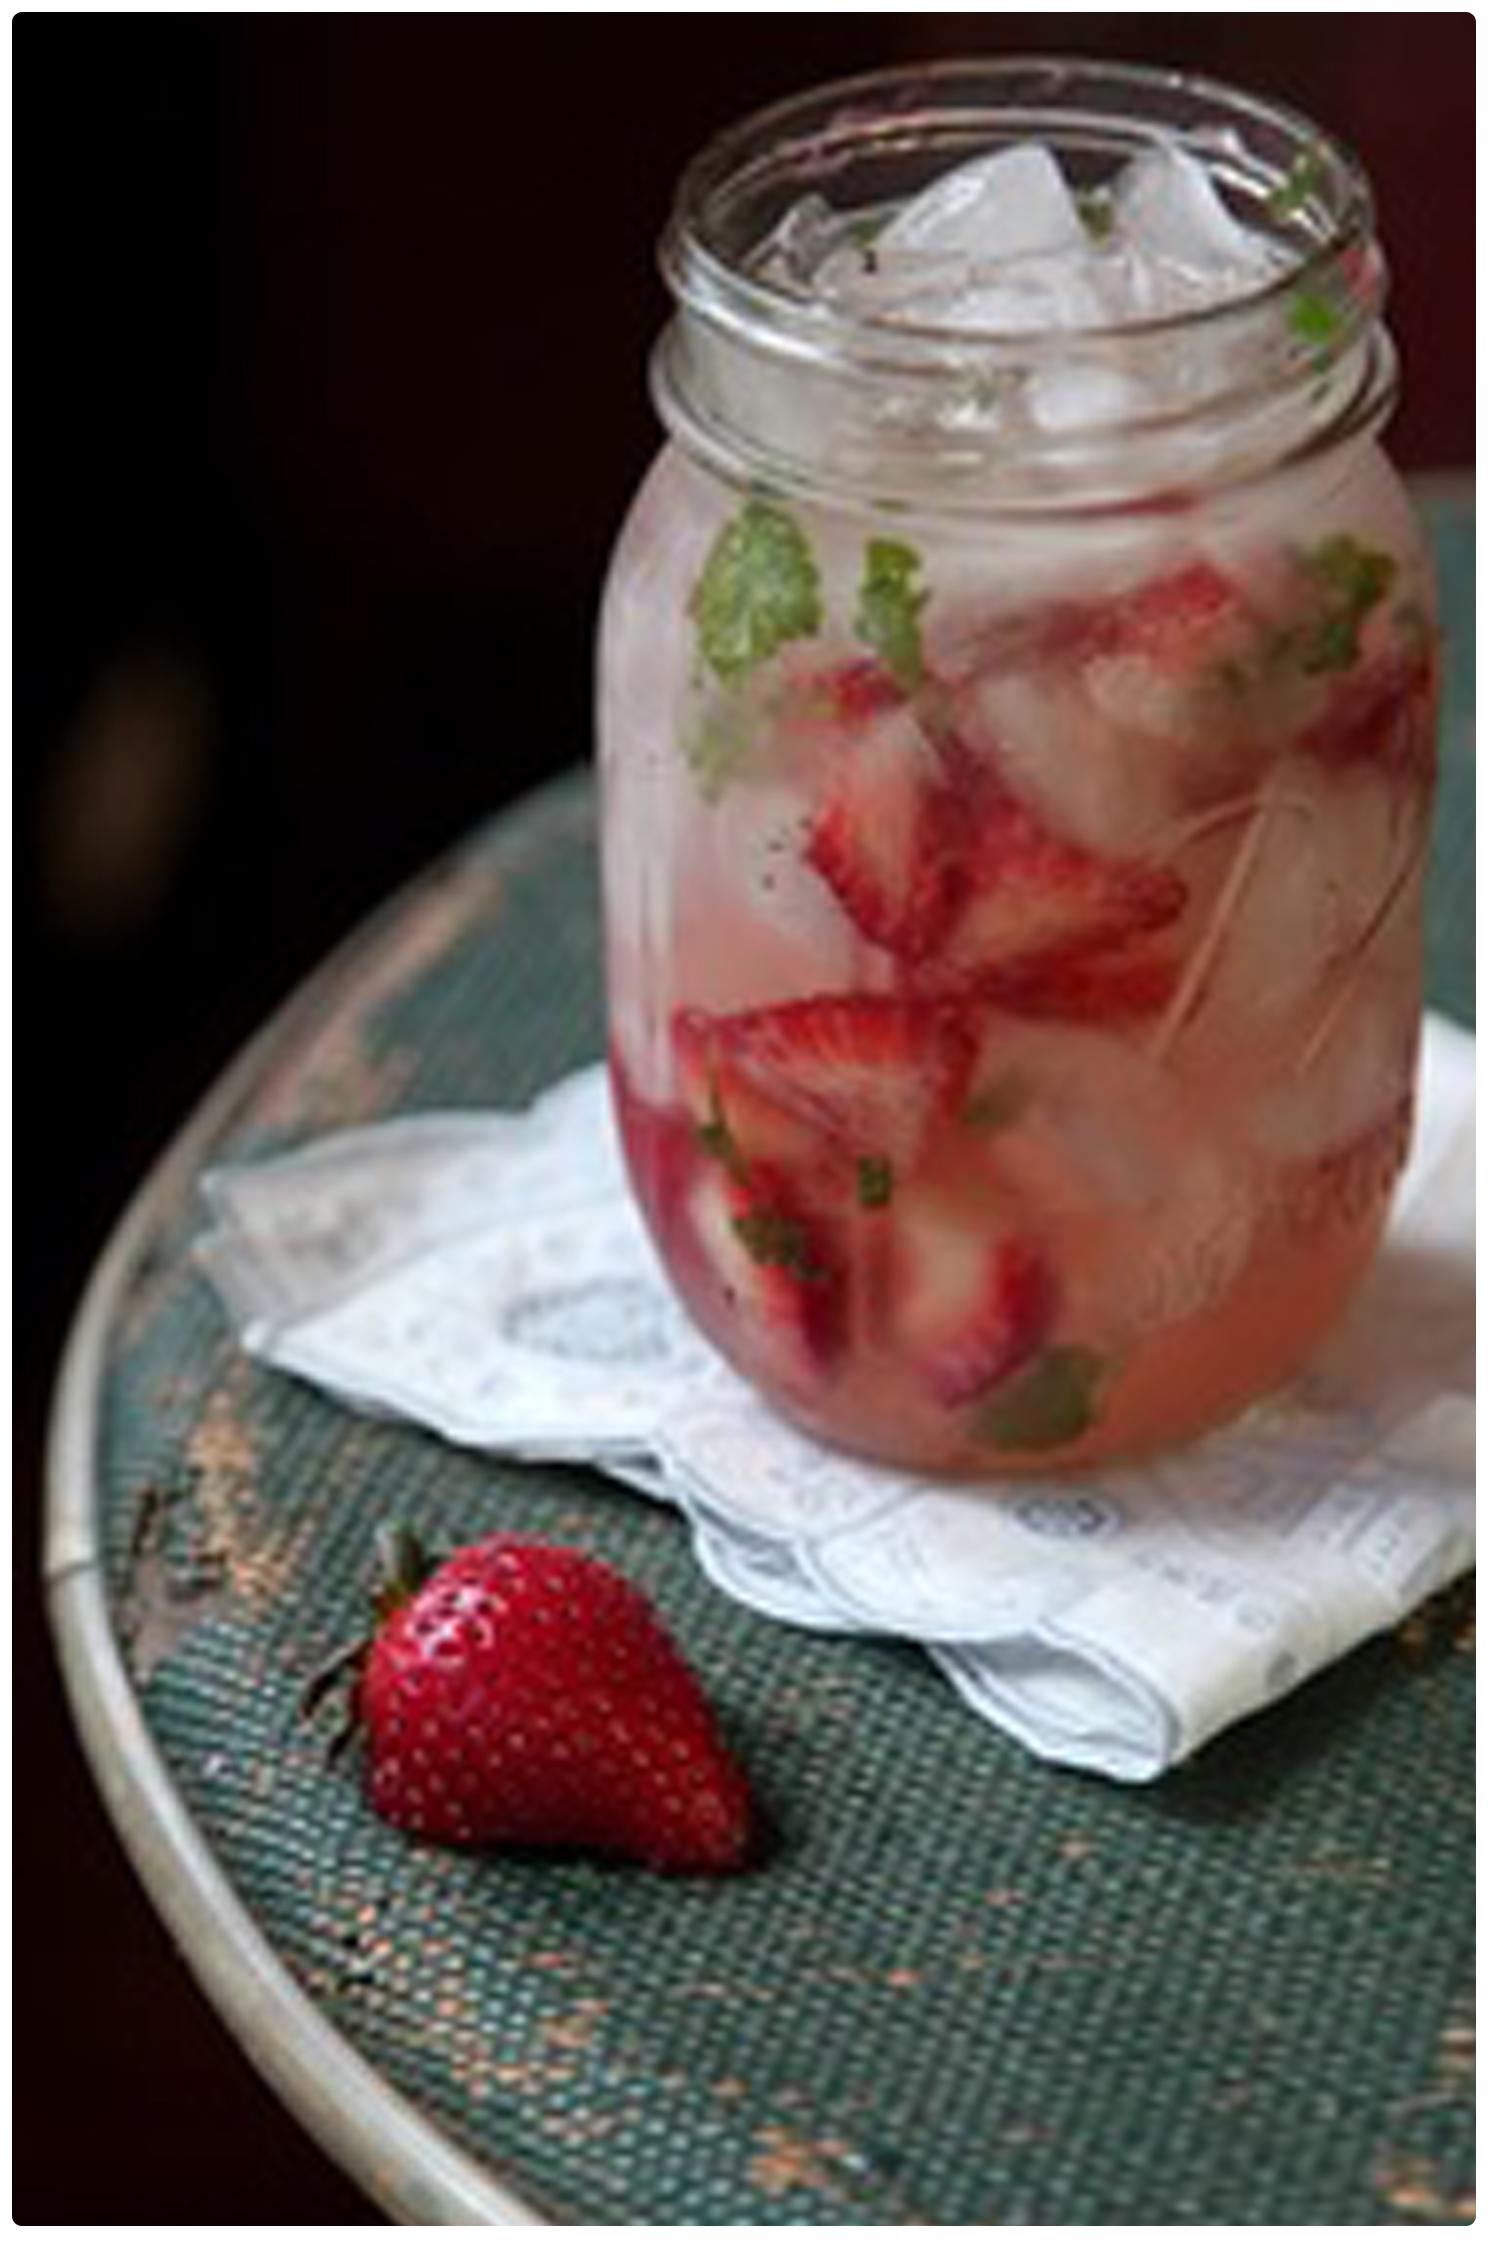 Strawberry Margarita Jar